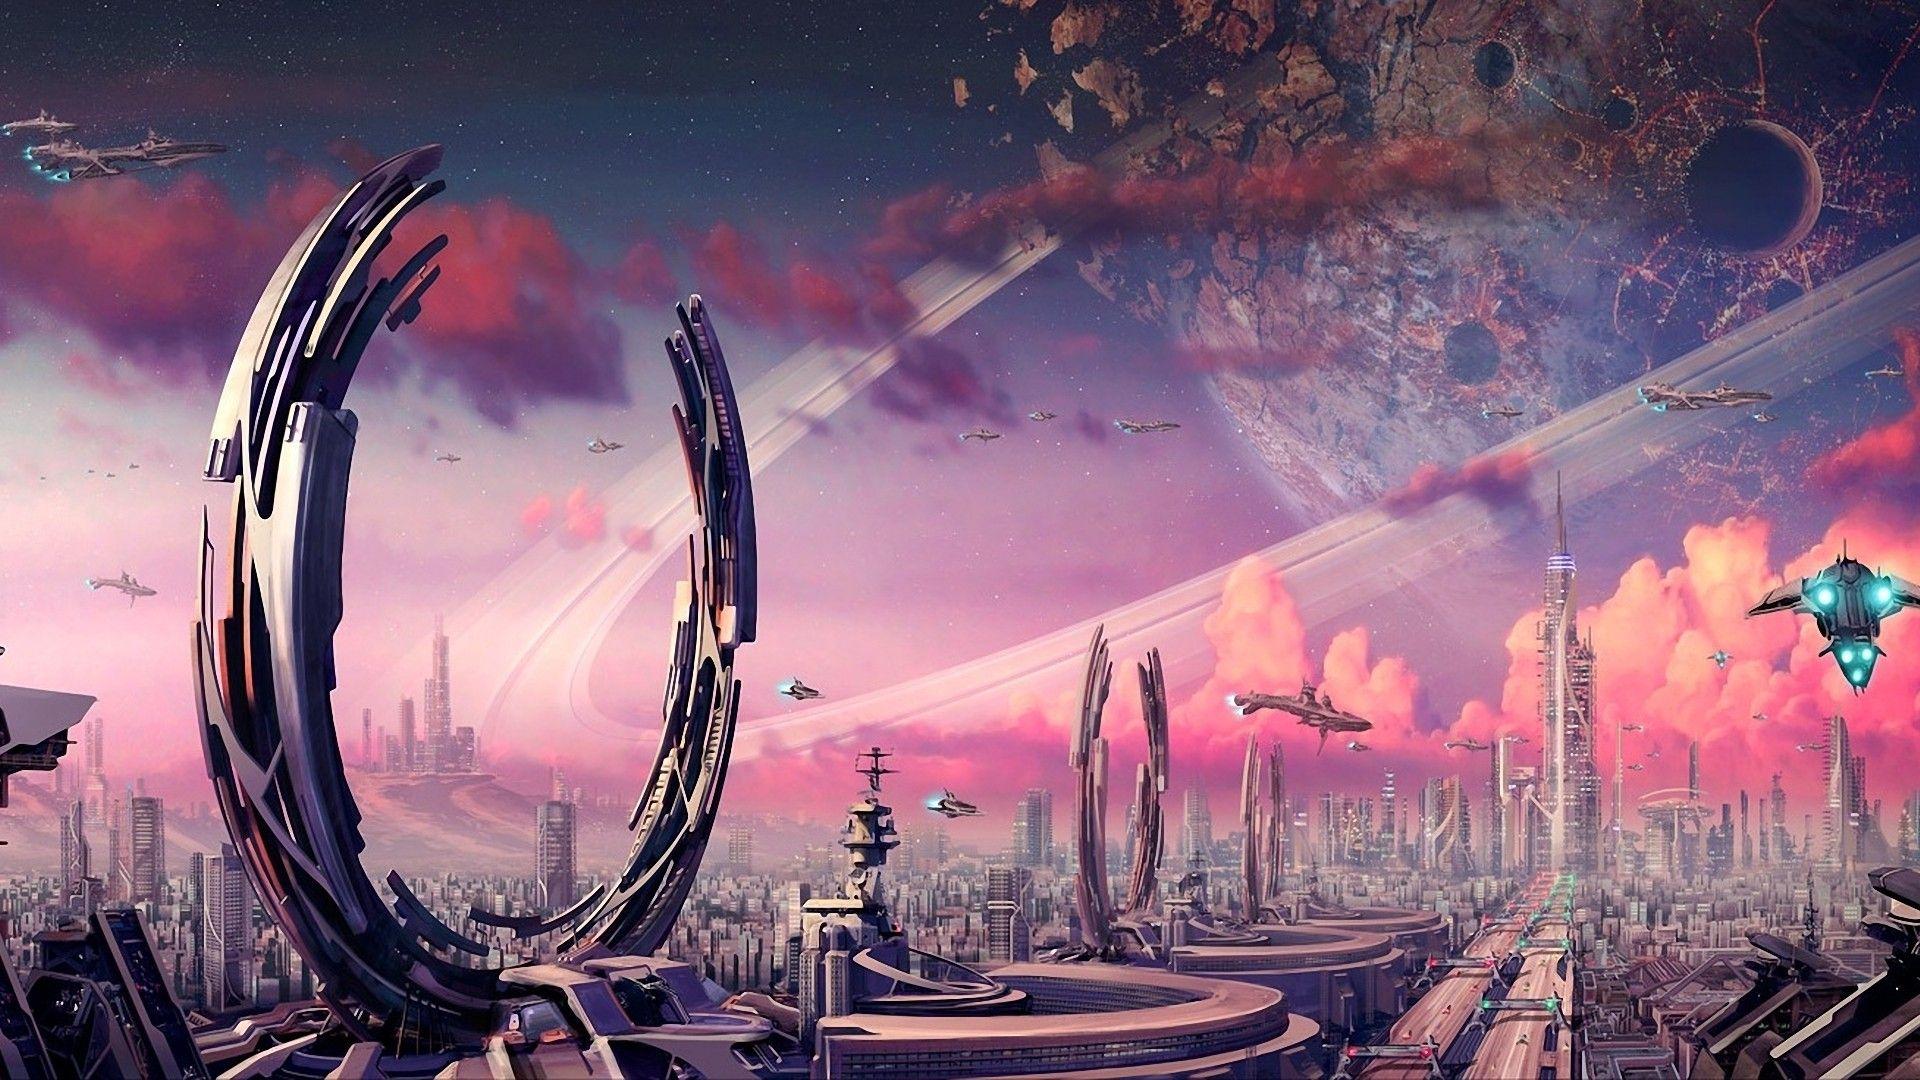 Alien City 1920 1080 Futuristic City Fantasy City Science